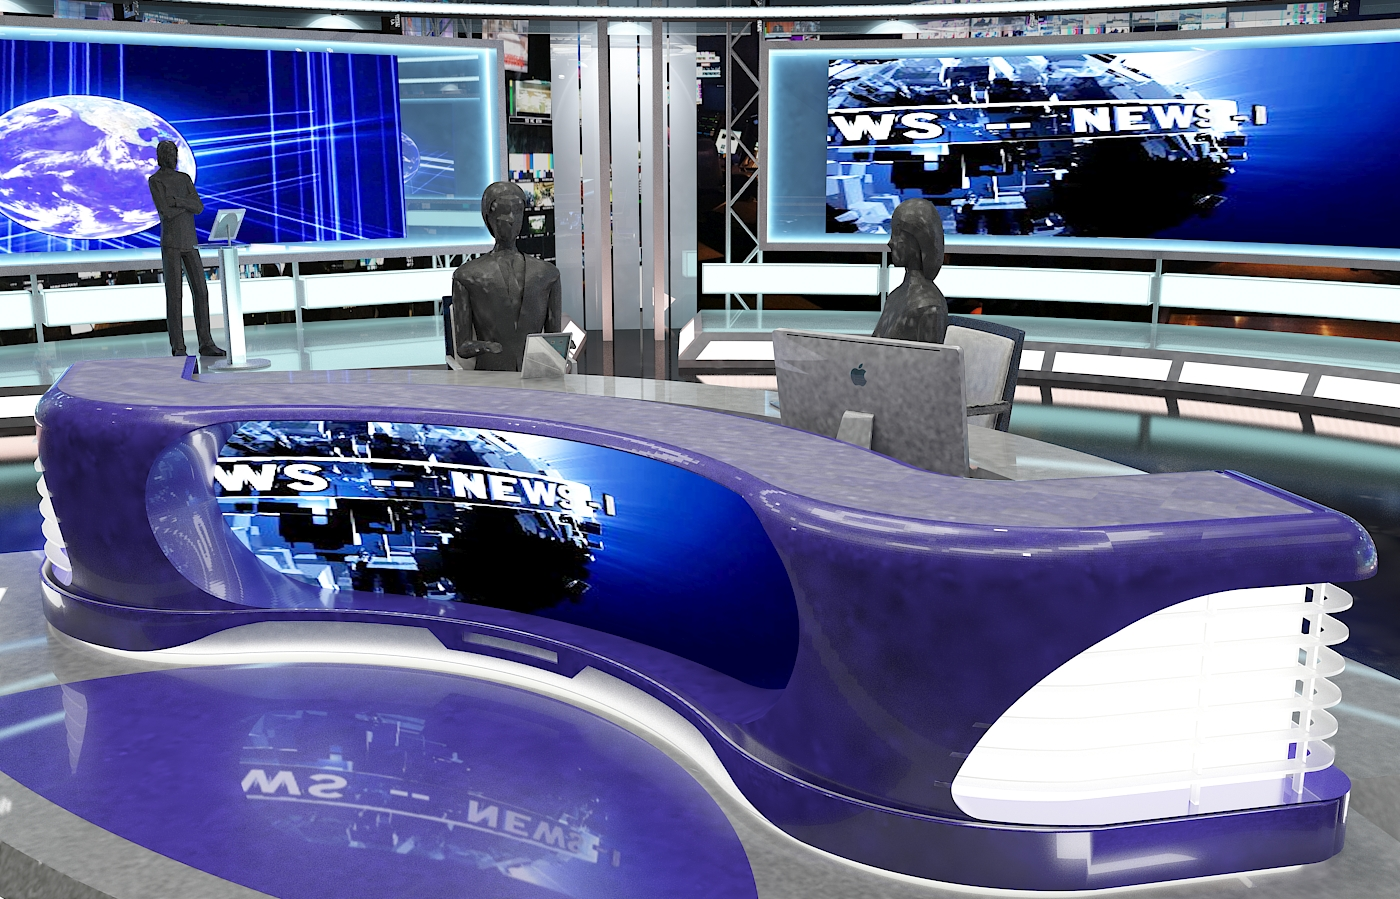 виртуал телевизийн студи цуглуулга vol 6 3d загвар max dxf dwg fbx obj 223379